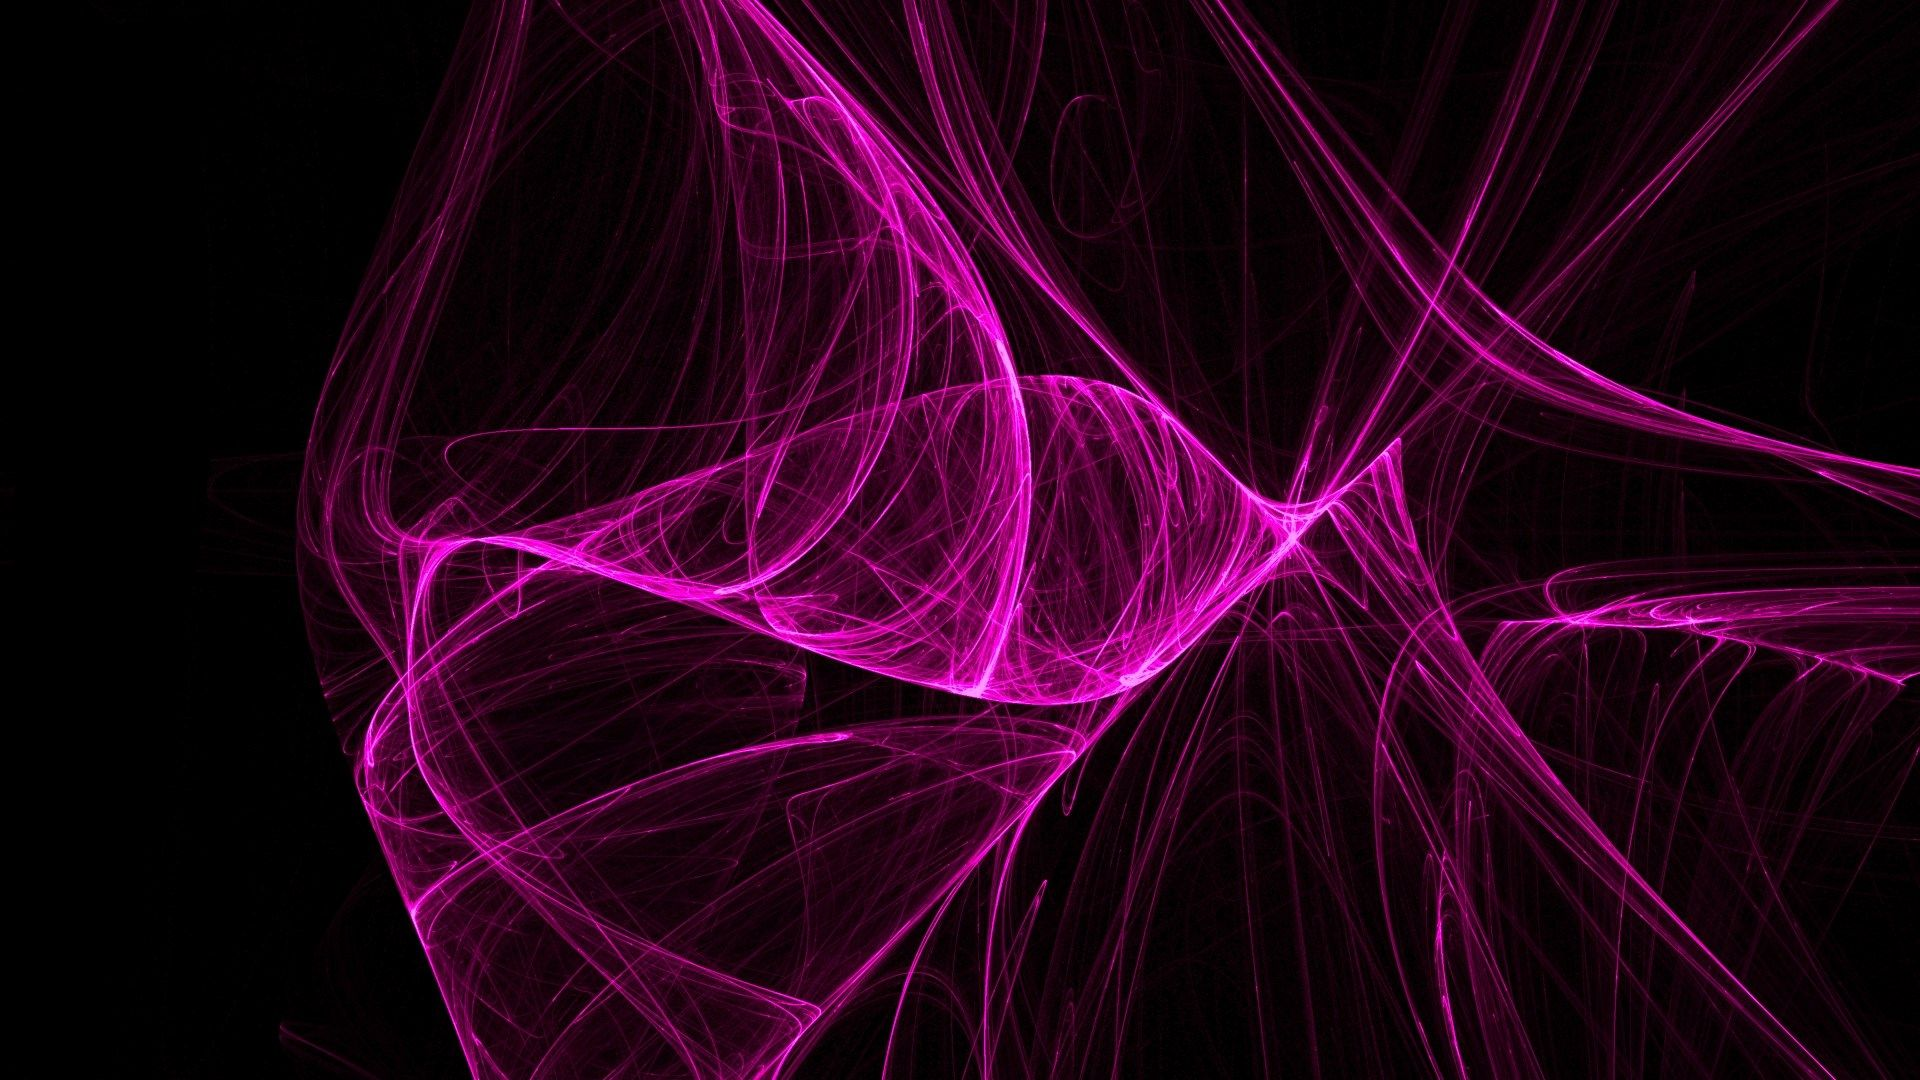 Pink Pictures To Download Cool Desktop Backgrounds Samsung Wallpaper Spring Desktop Wallpaper